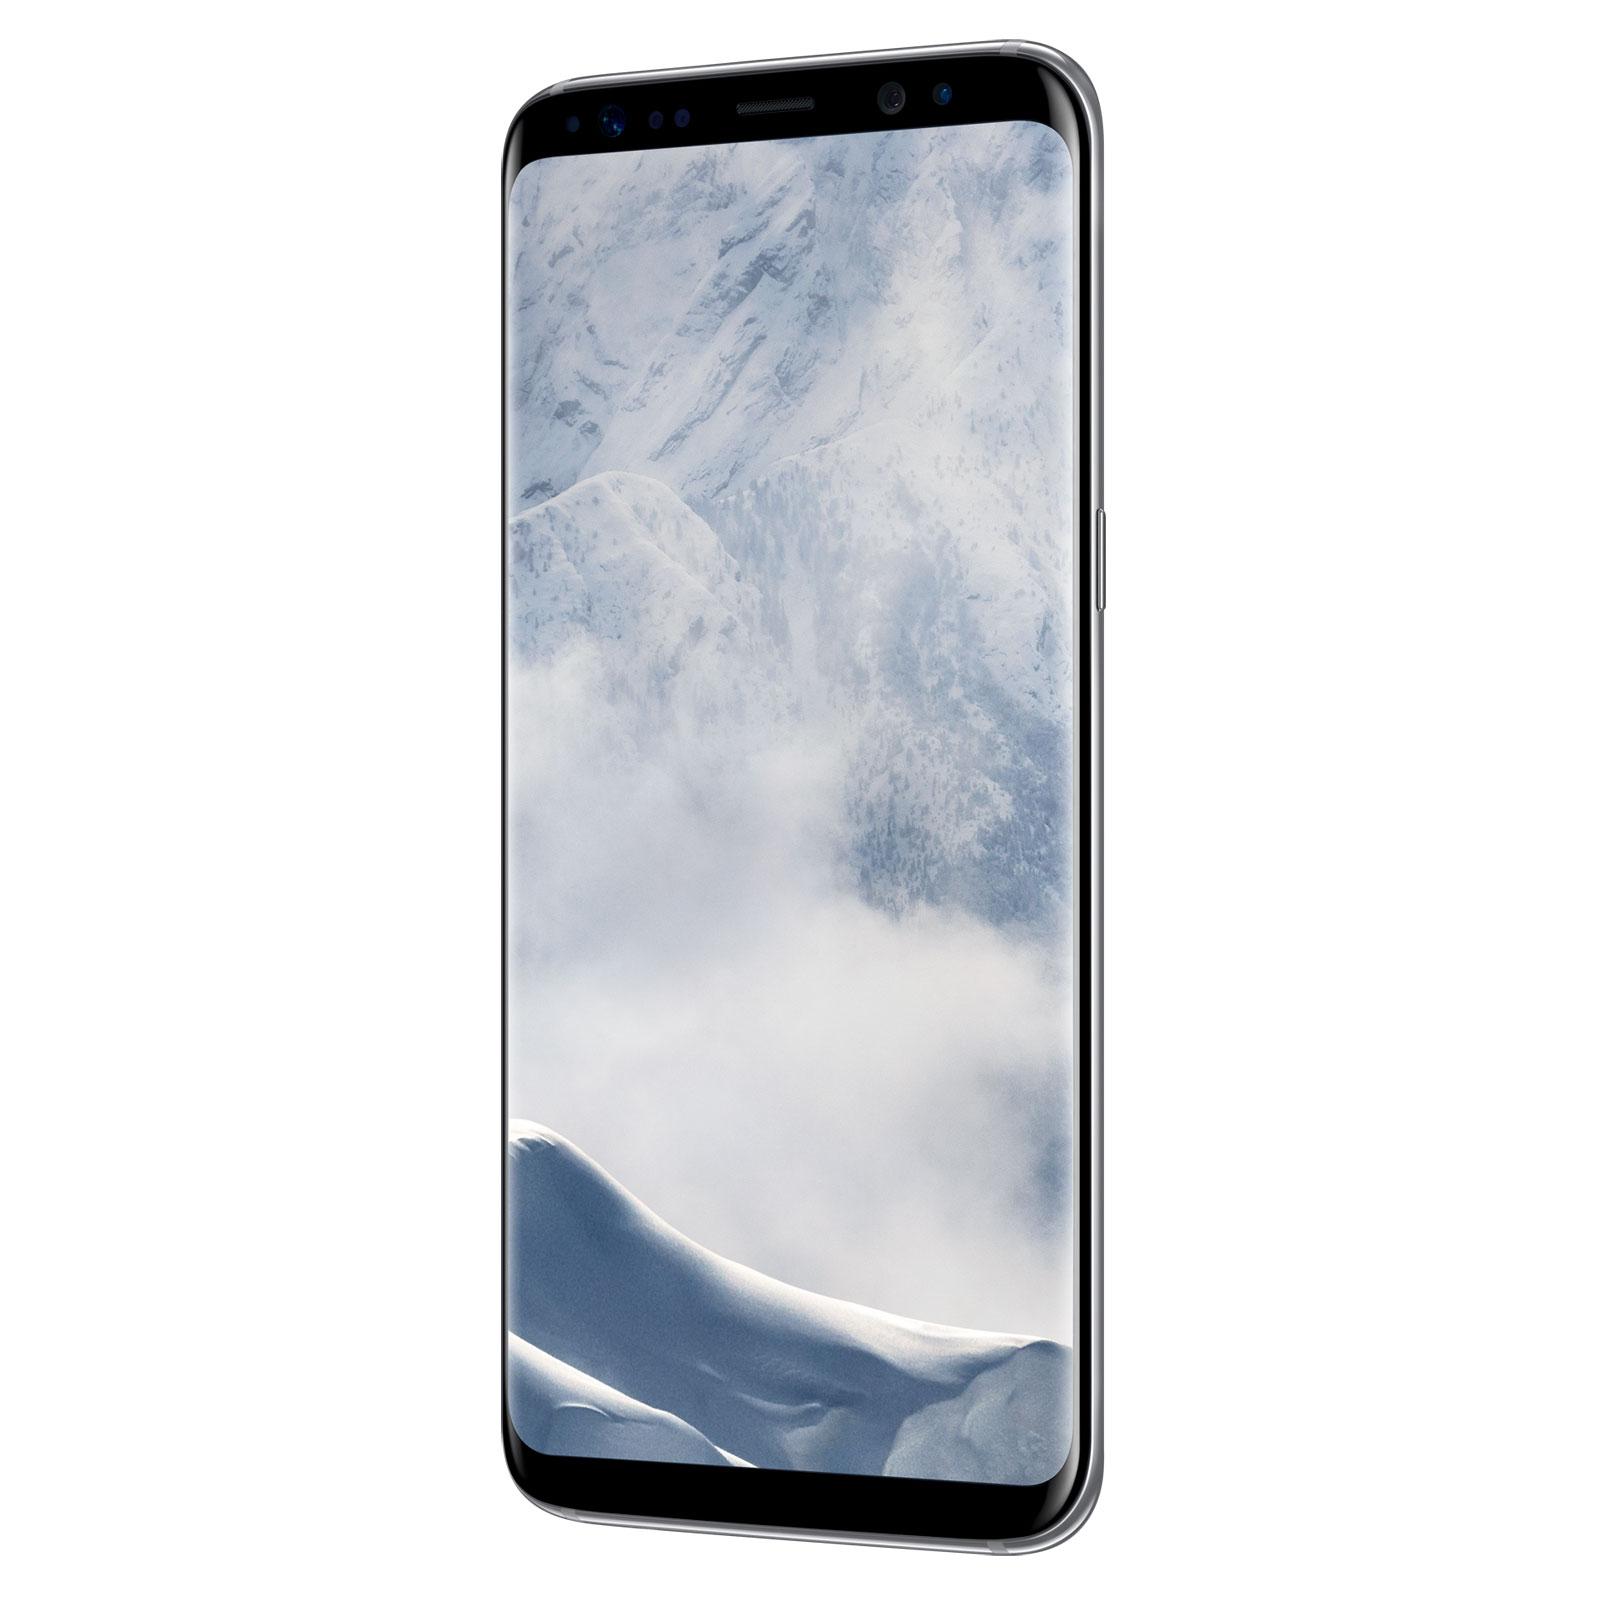 Samsung Galaxy S8 64Go G950 Artic Silver - Téléphonie Samsung - 3